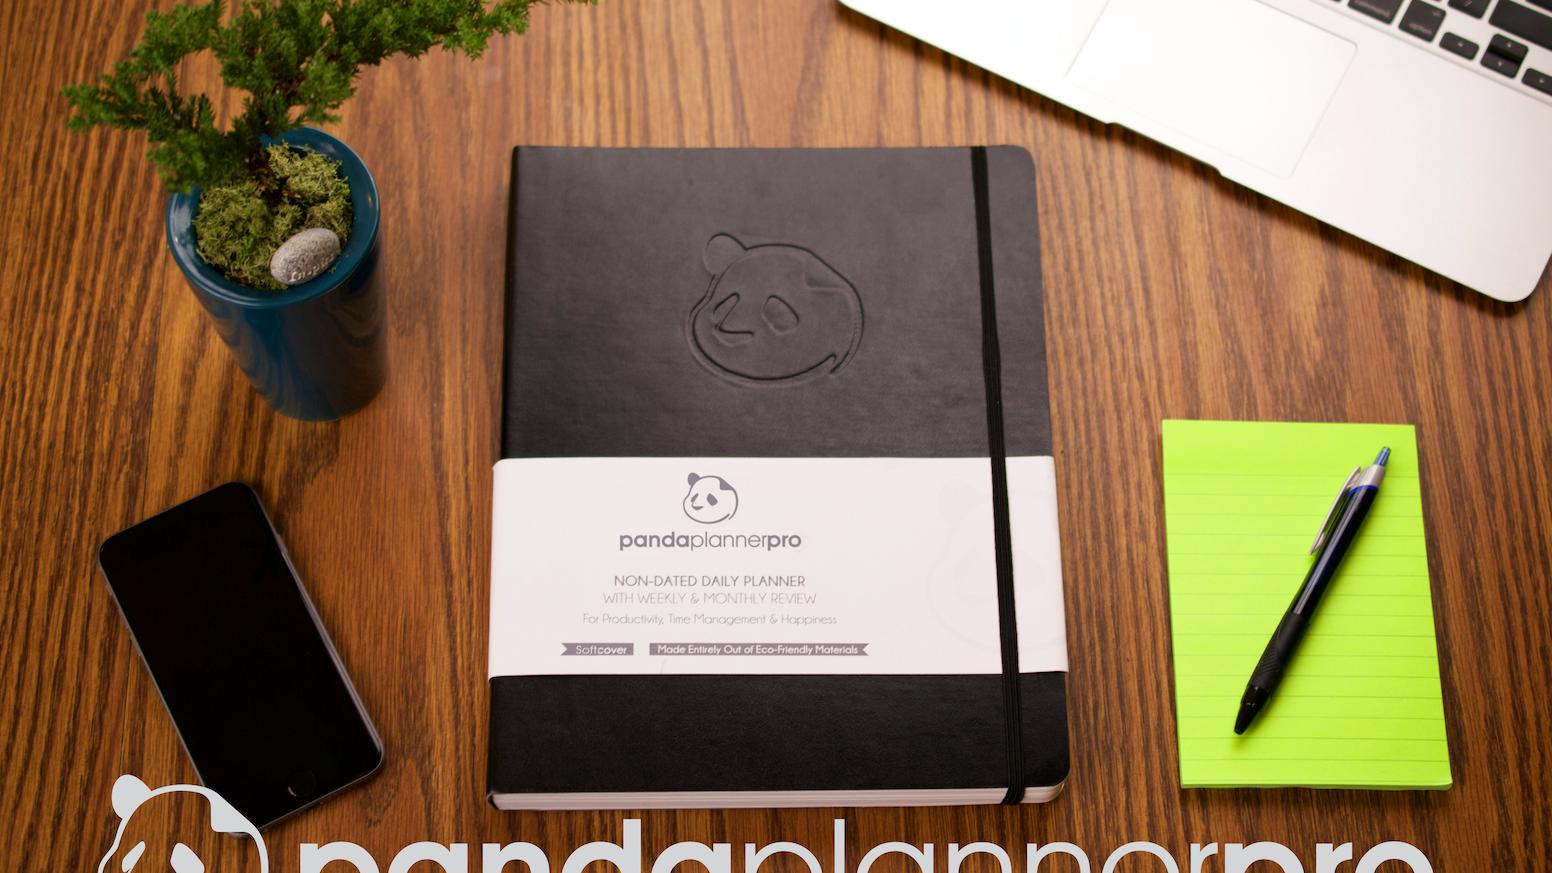 panda planner pro happiness productivity success by michael